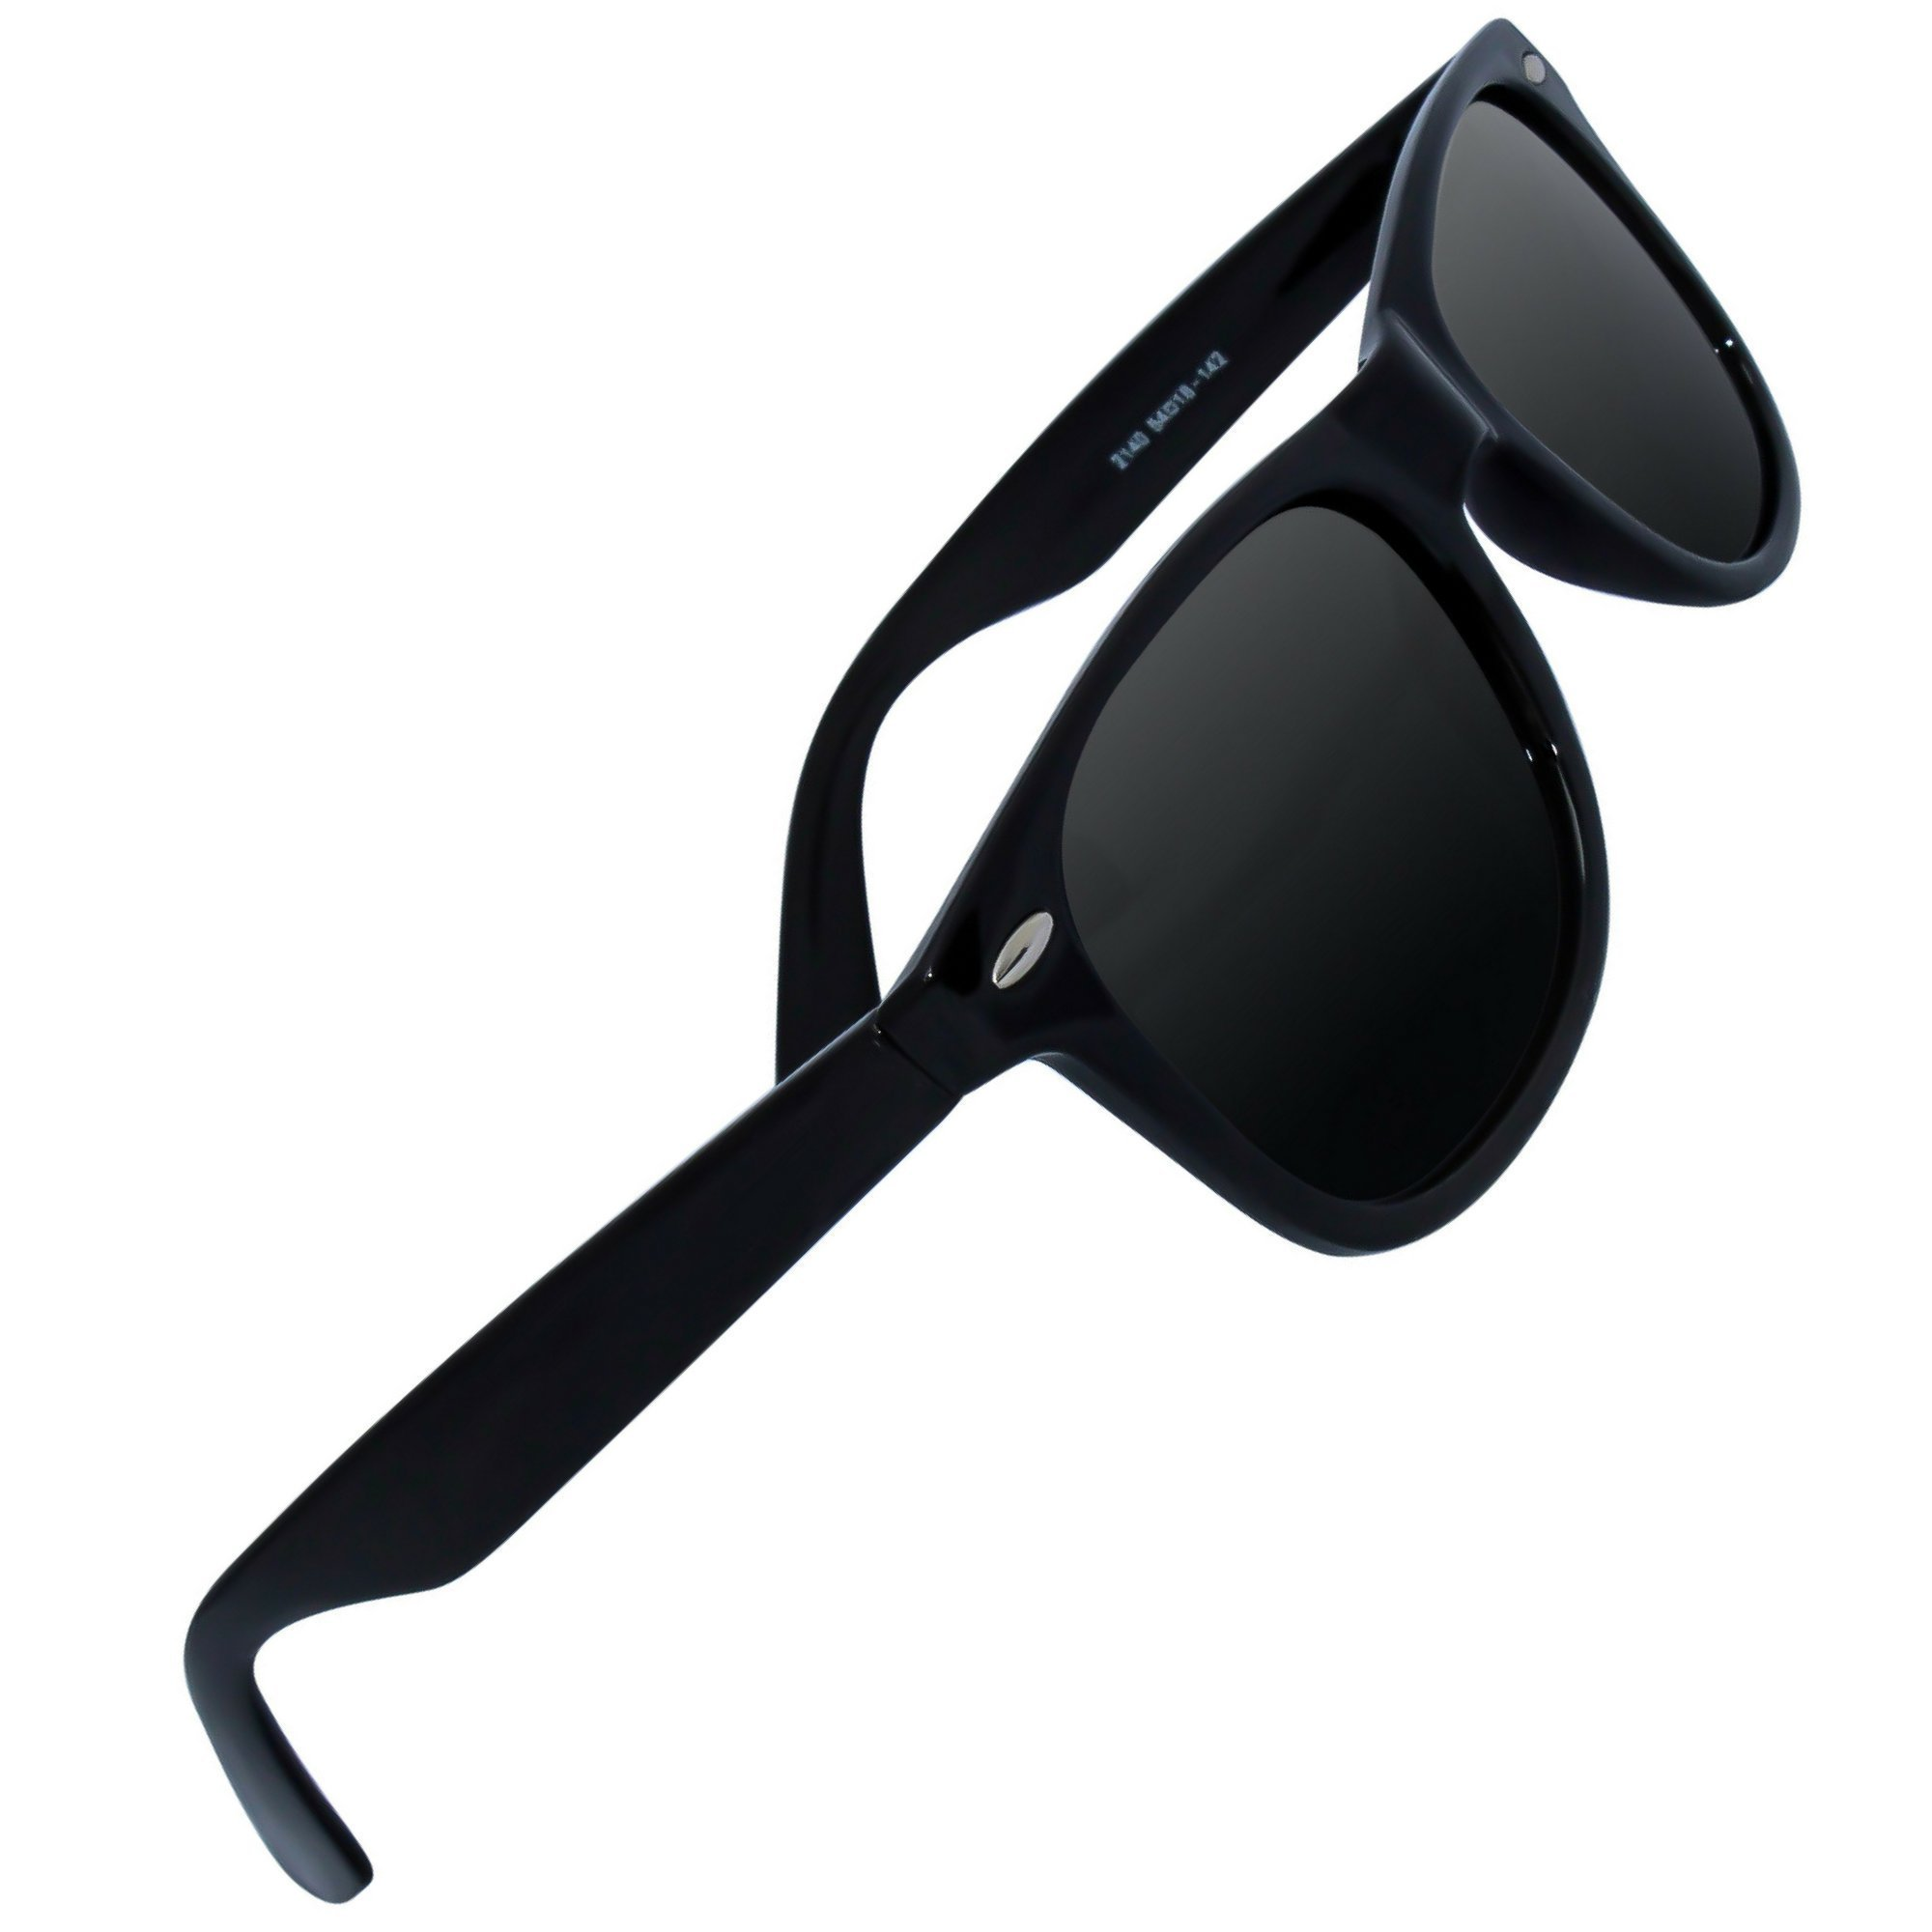 Eye Love Polarized Sunglasses for Men & Women | Glare-Free | 100% UV Blocking | 5+ COLORS (Glossy Black Frame | Grey High Definition Polarized Lenses)